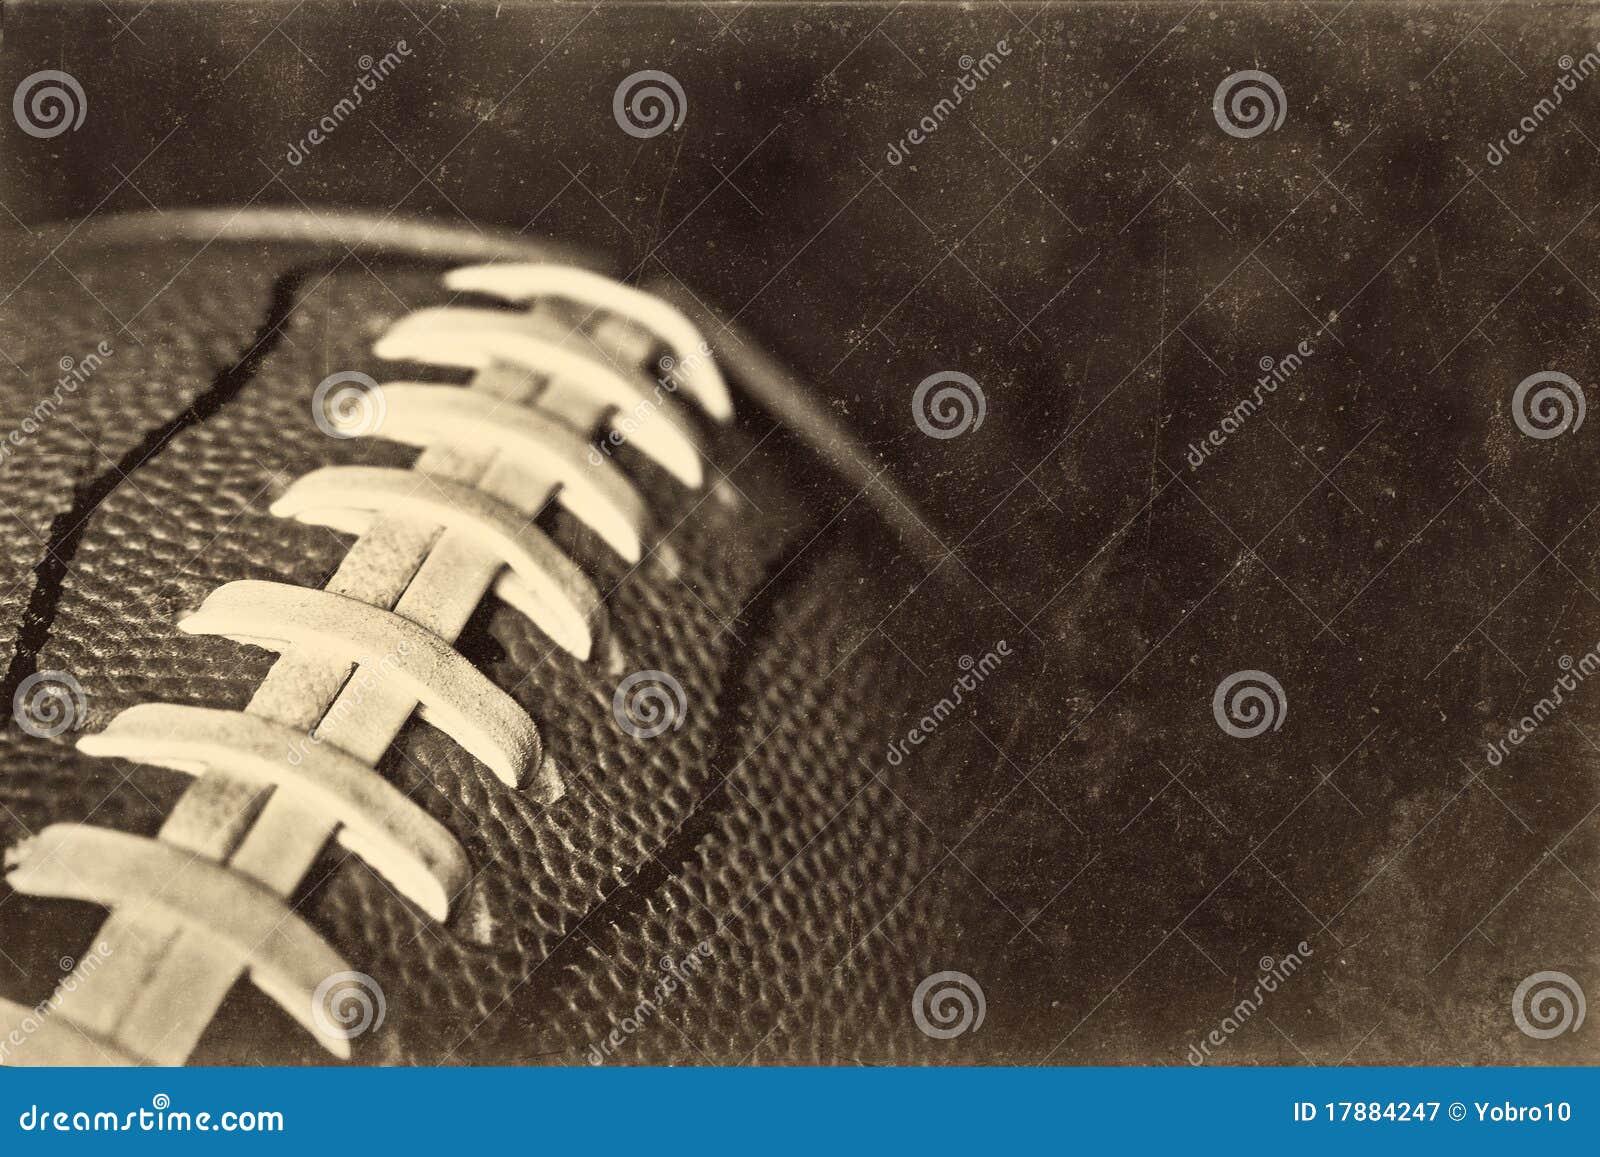 Retro Grunge American Football Background